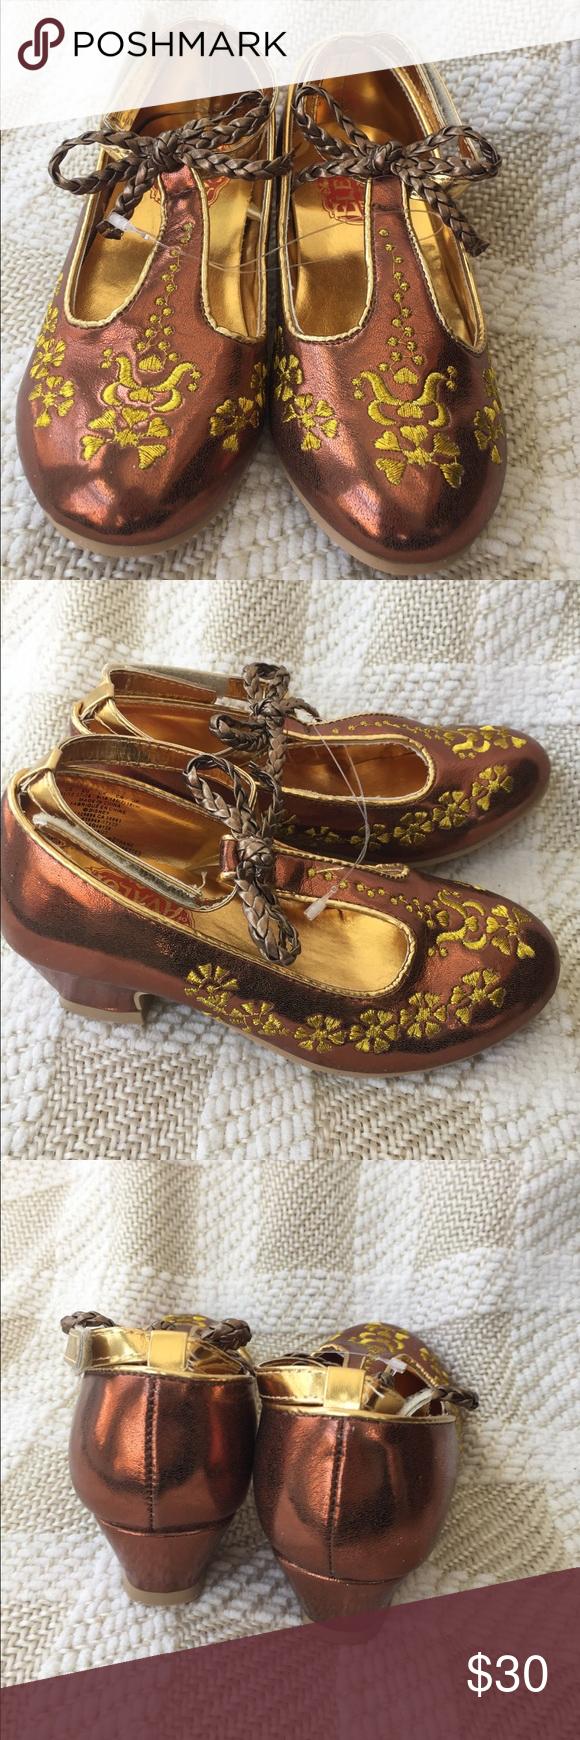 disney elena of avalor shoes